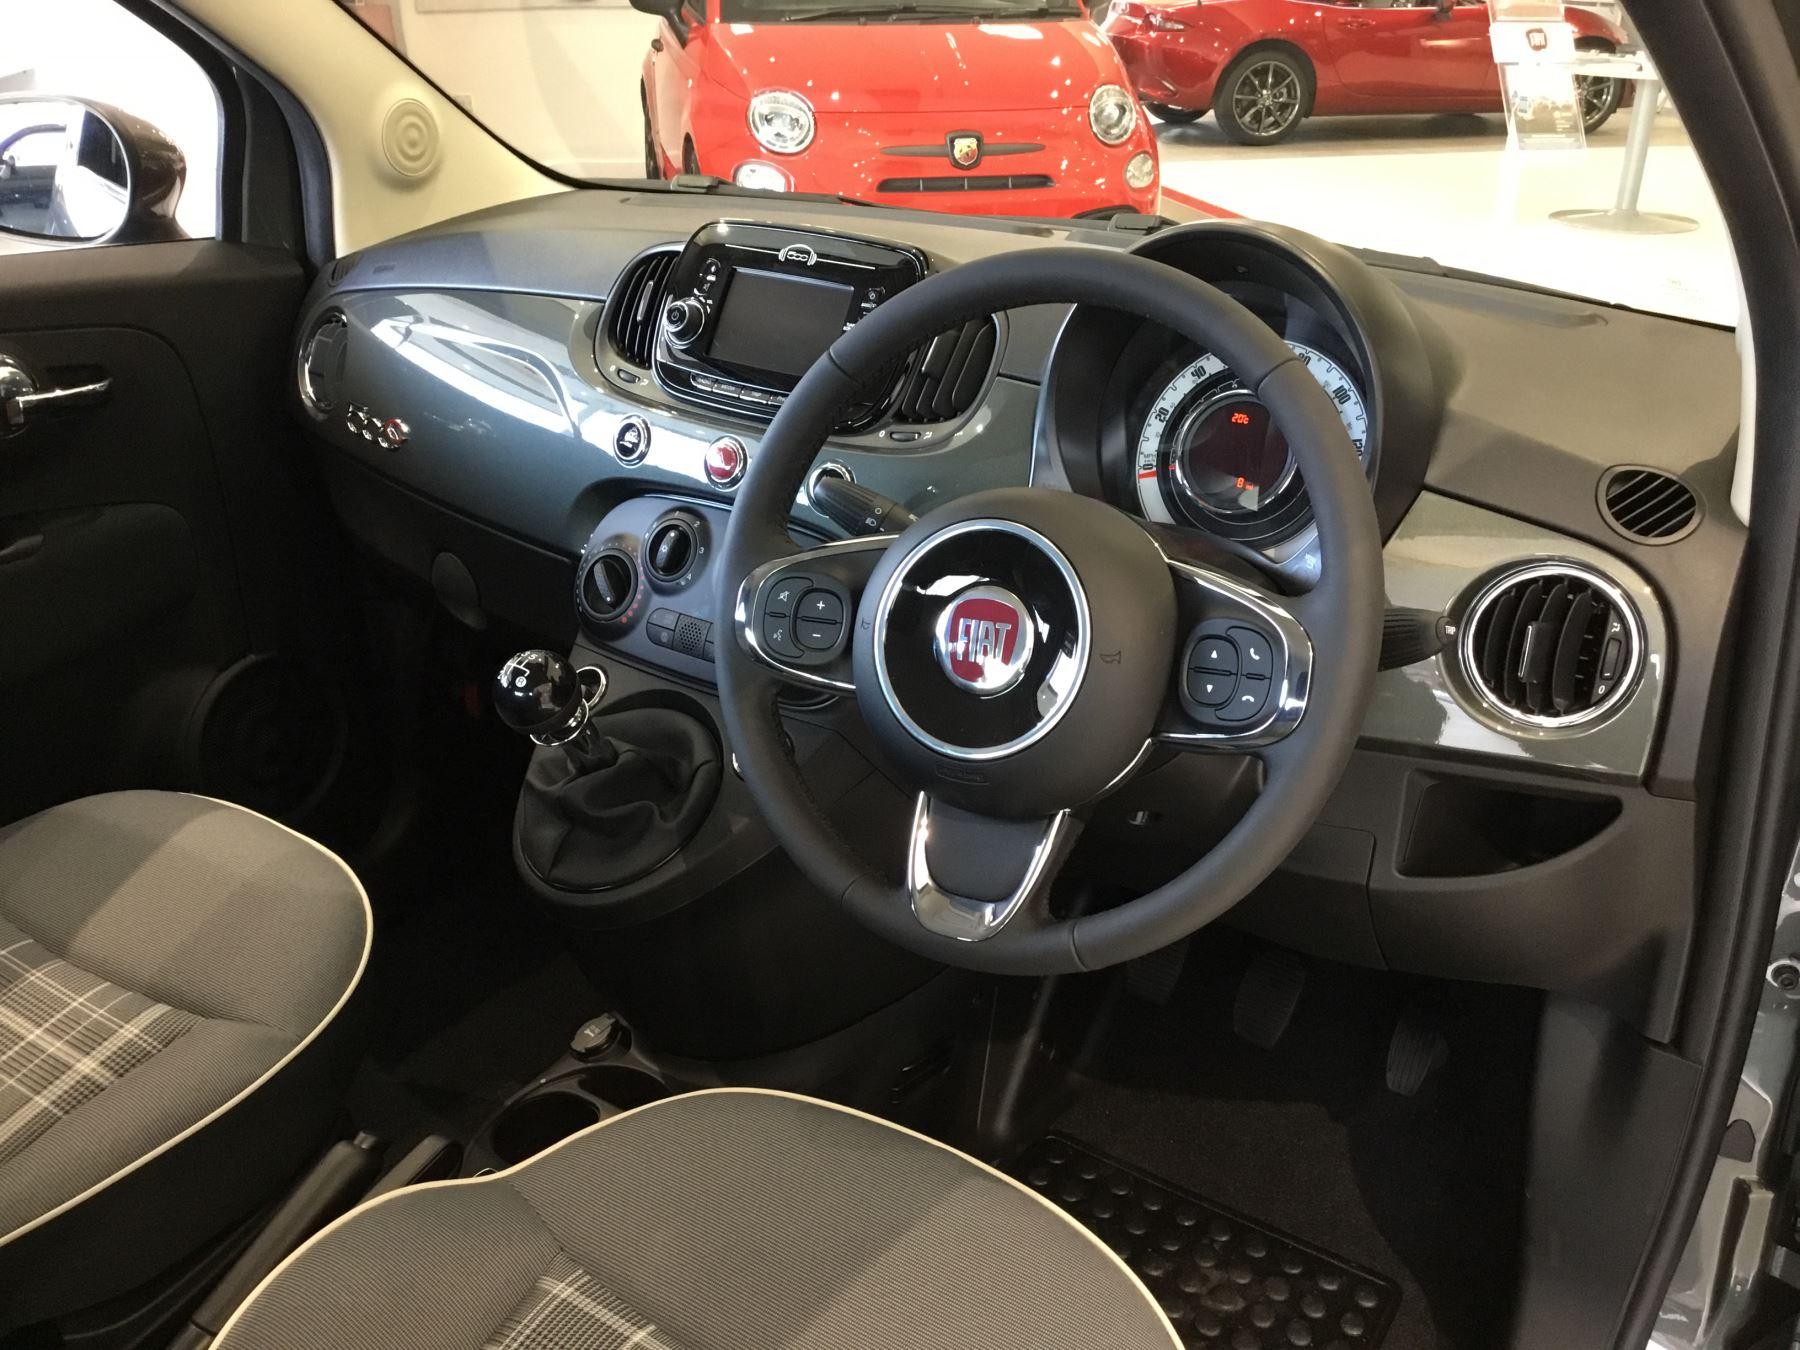 Fiat 500 1.2 Lounge 2dr image 10